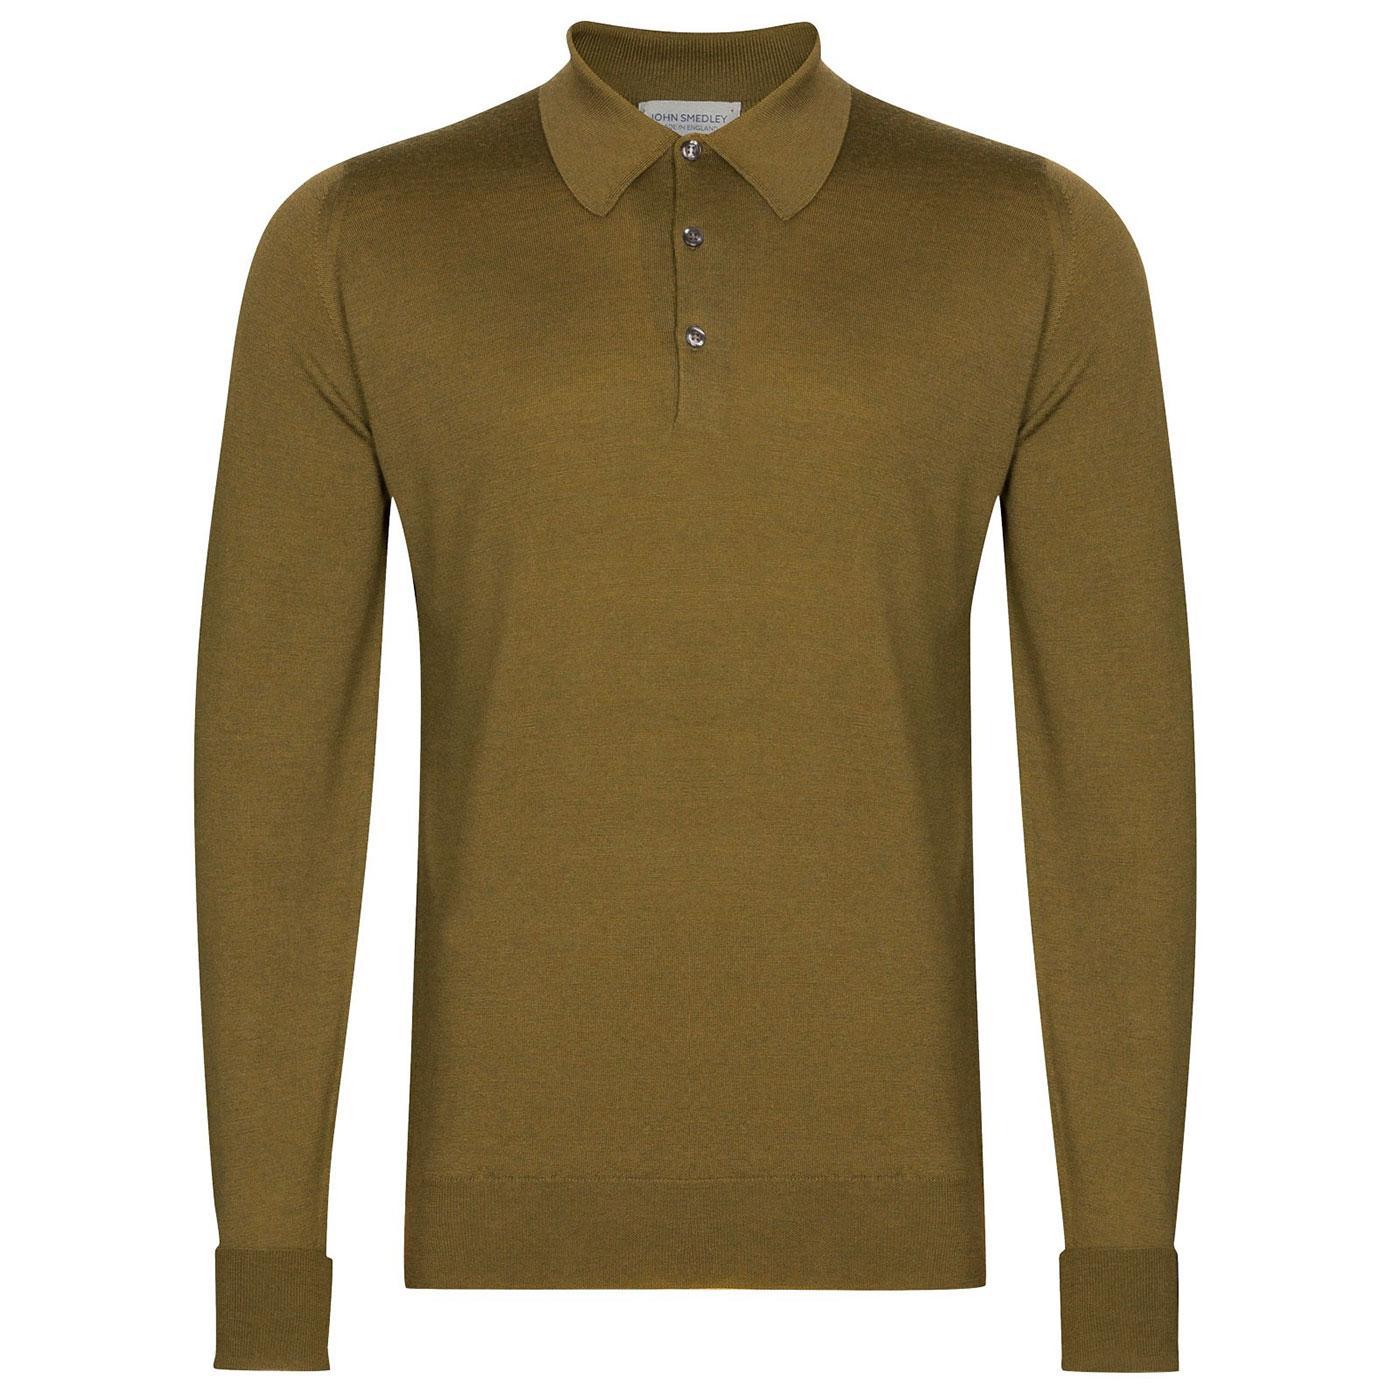 Dorset JOHN SMEDLEY Mens Knitted Mod Polo Shirt WG